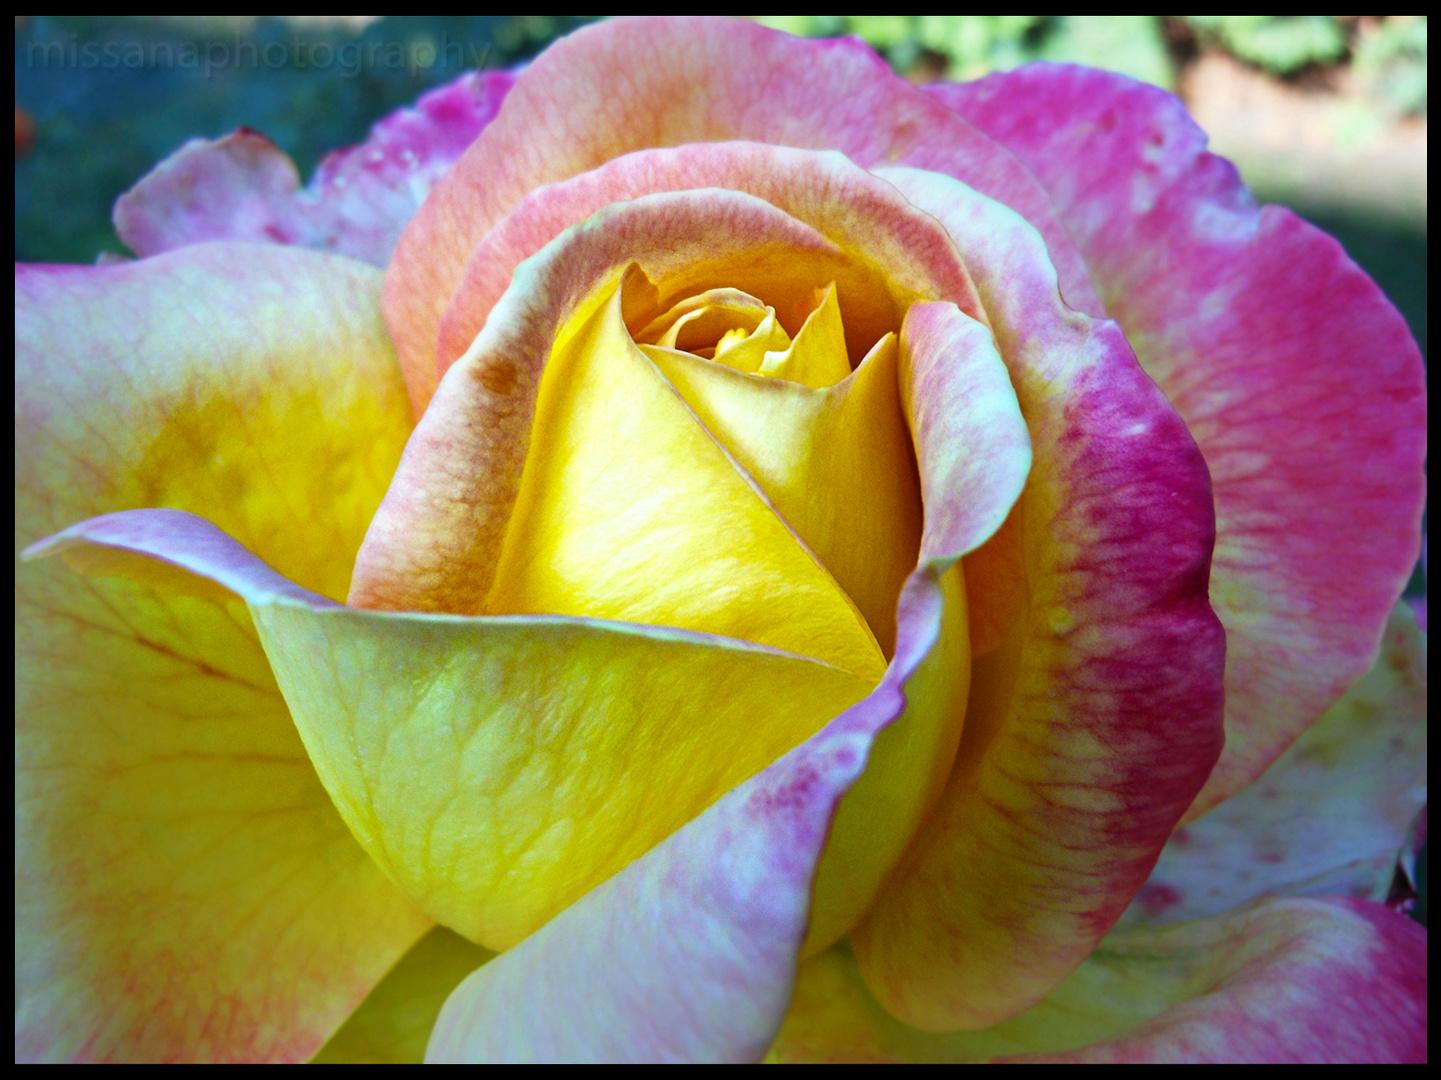 elegance is a glowing inner peace